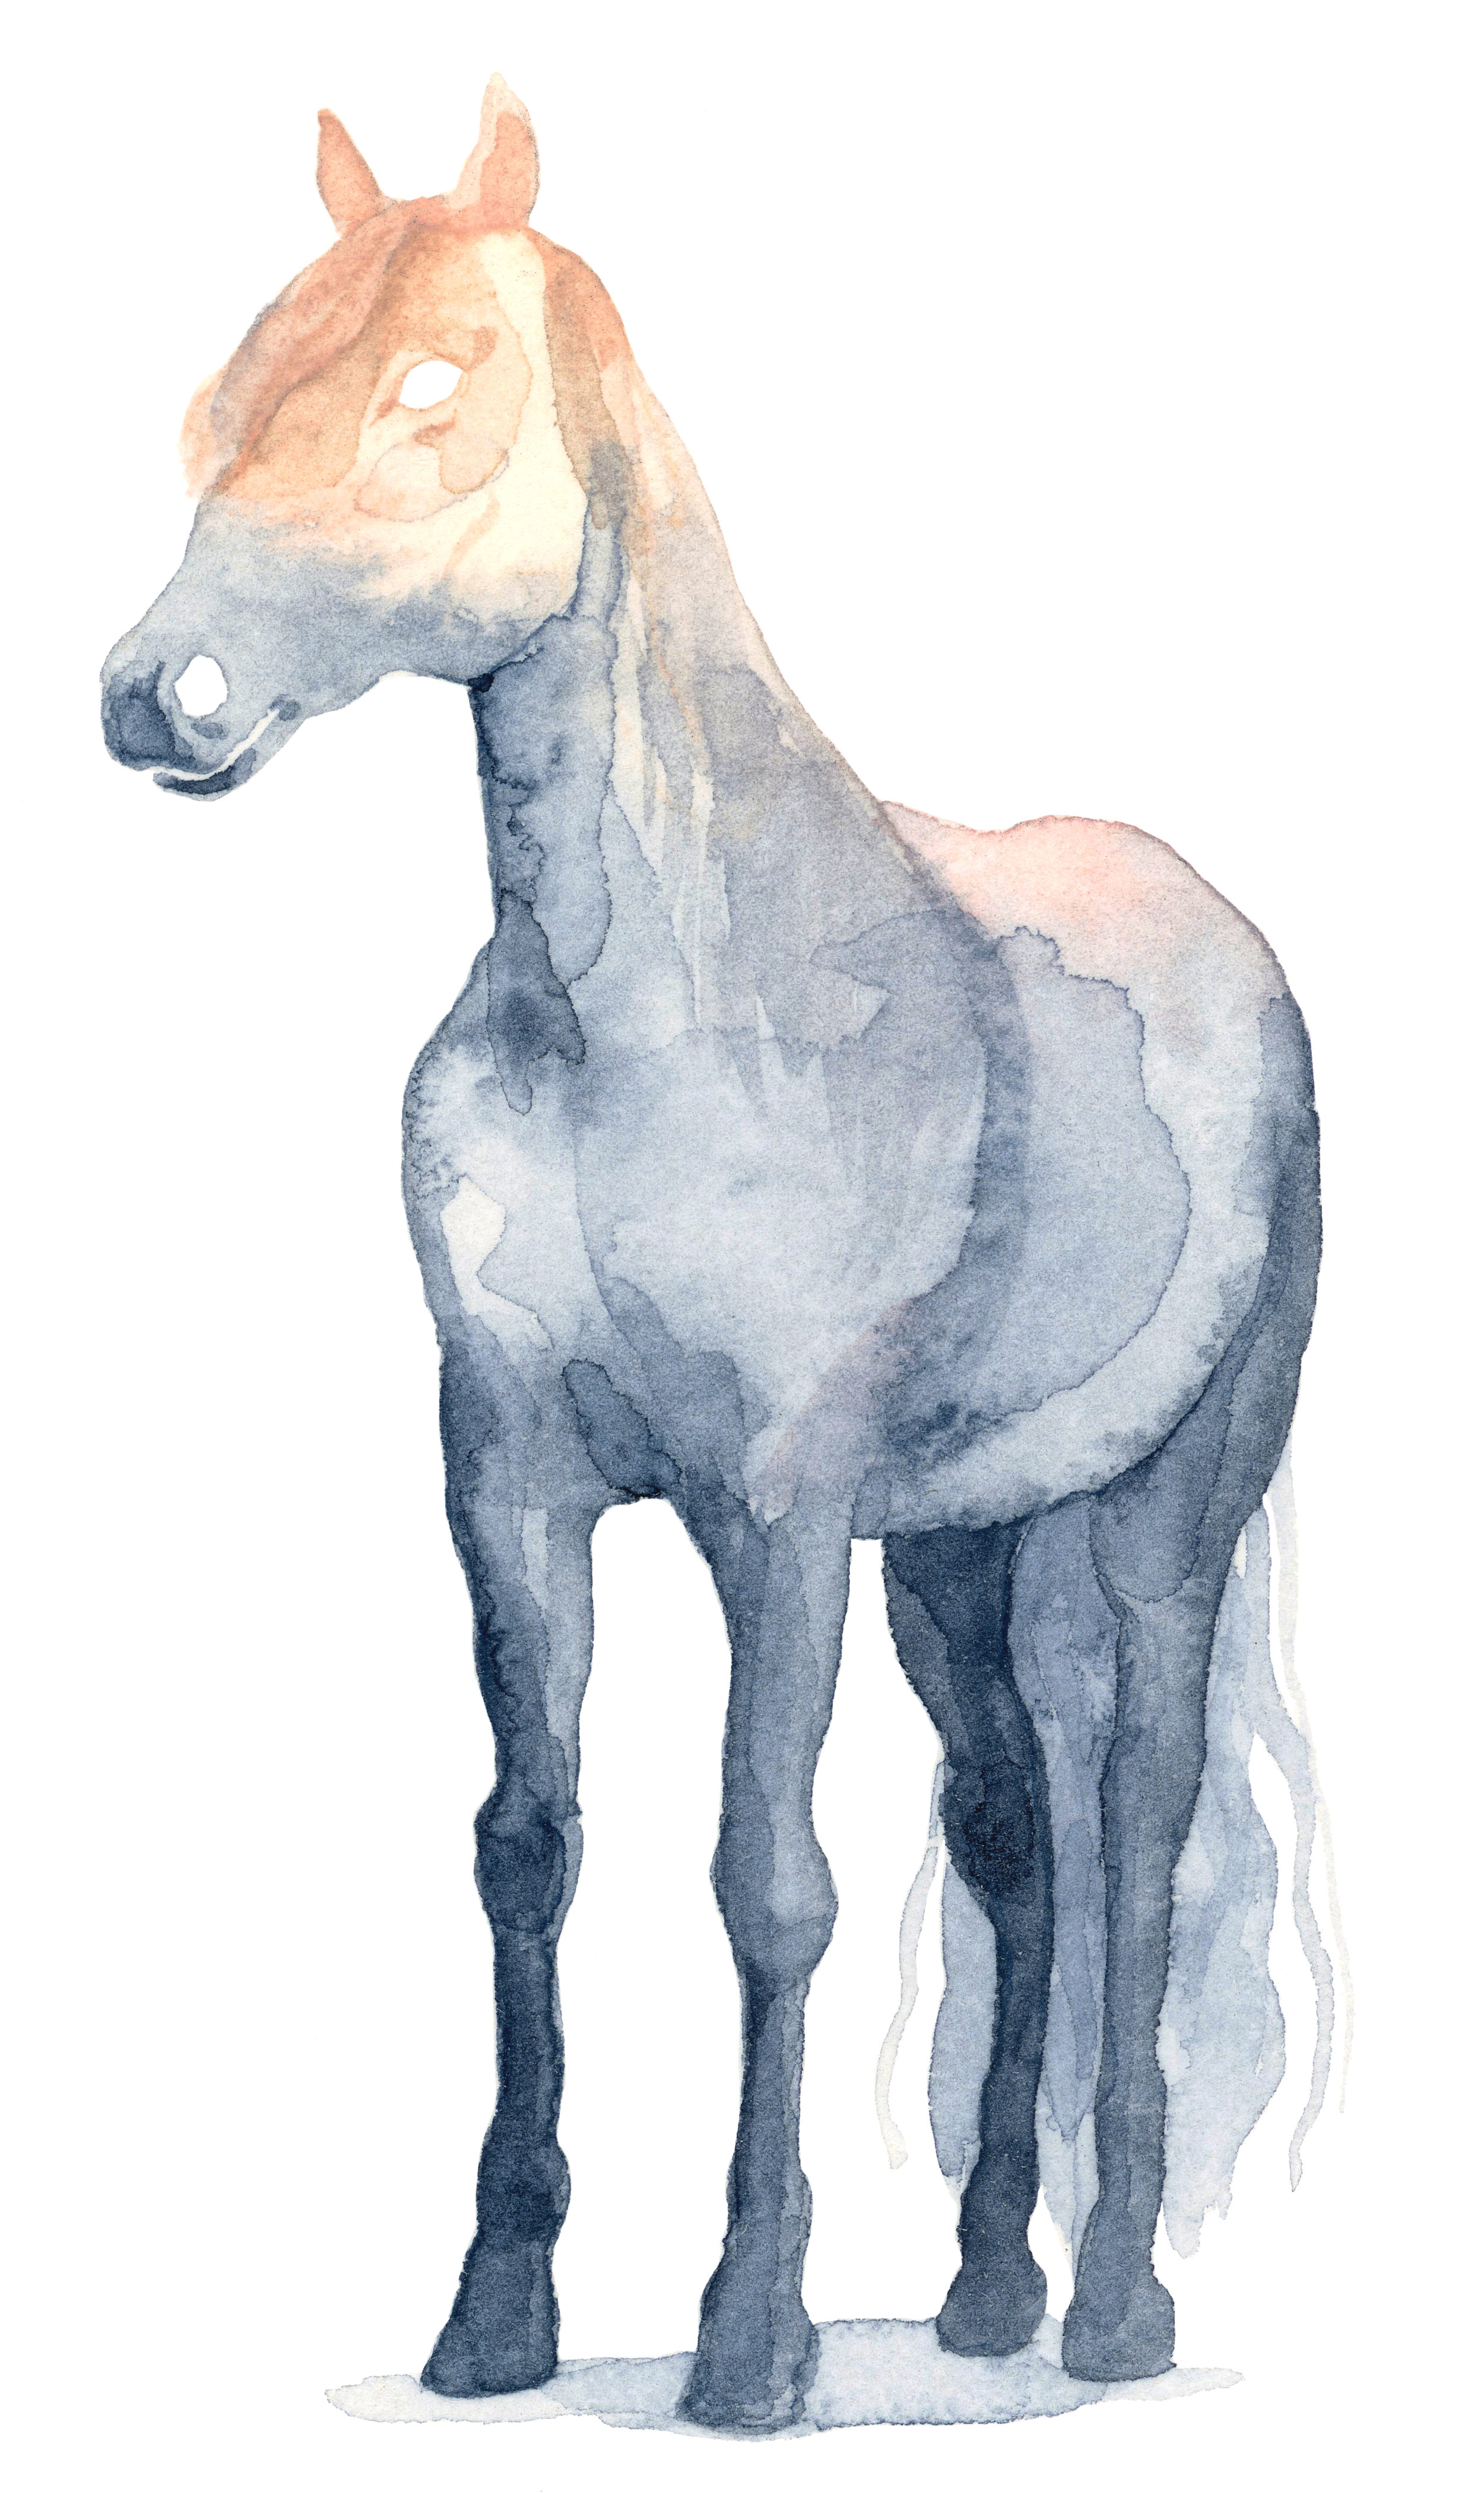 misty-horse-lrg.jpg